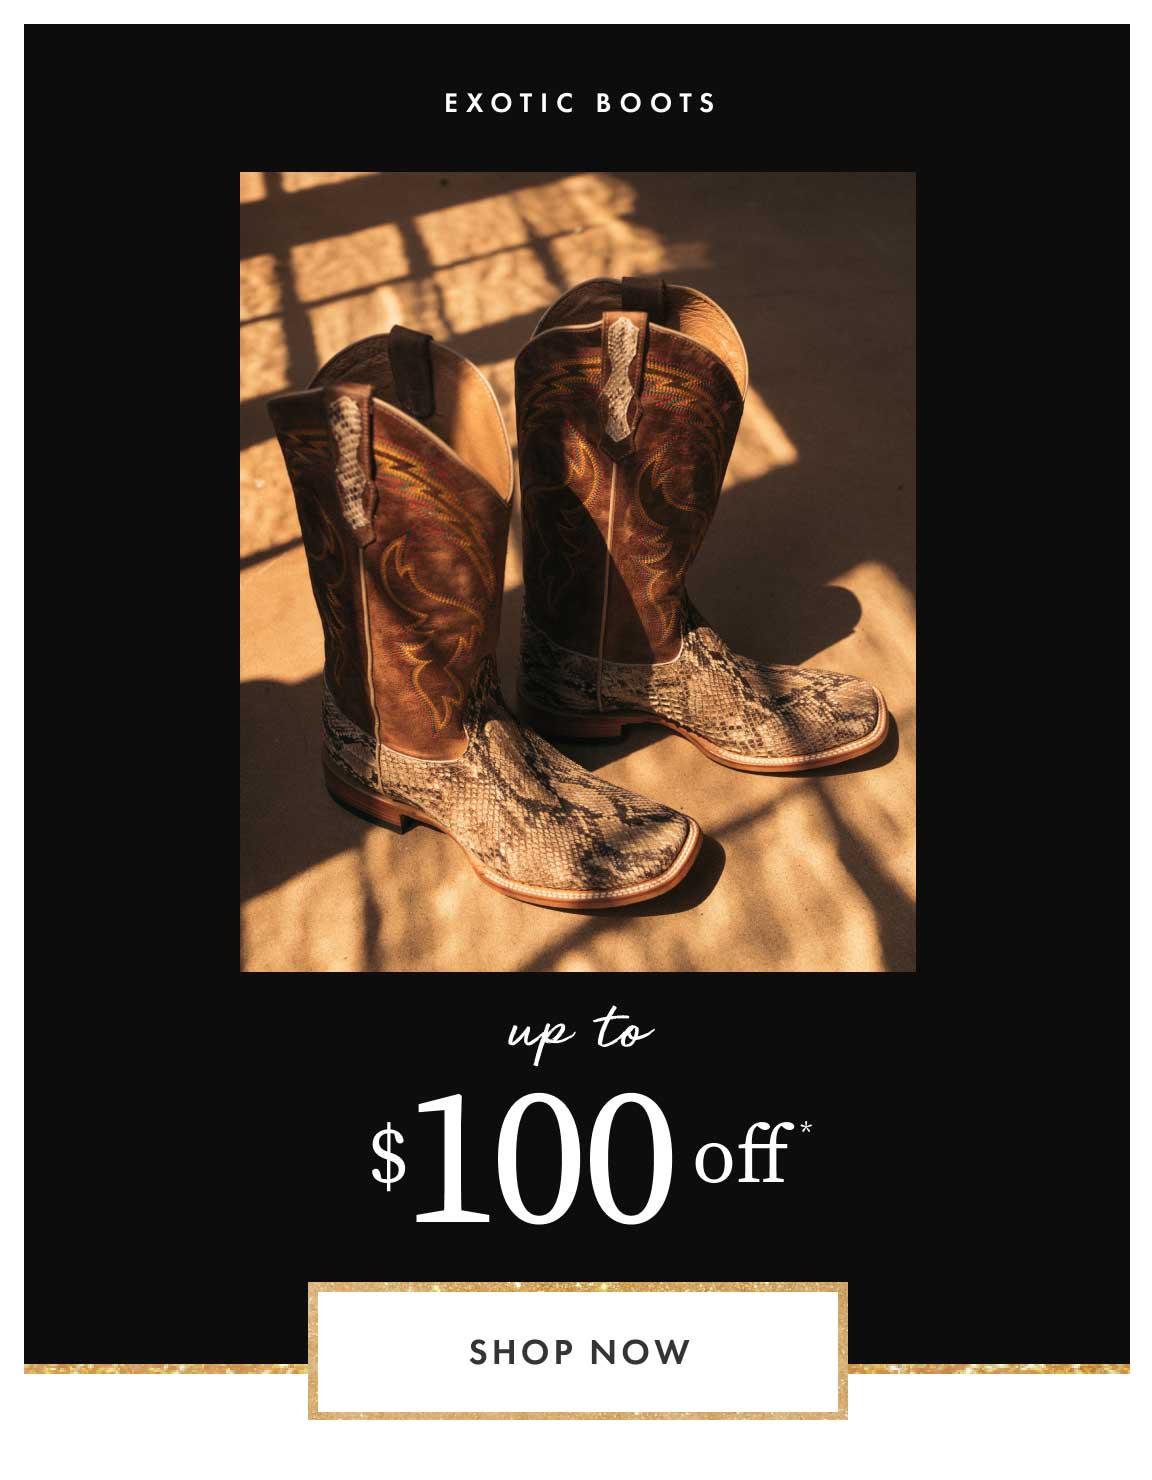 Shop Exotic Boots